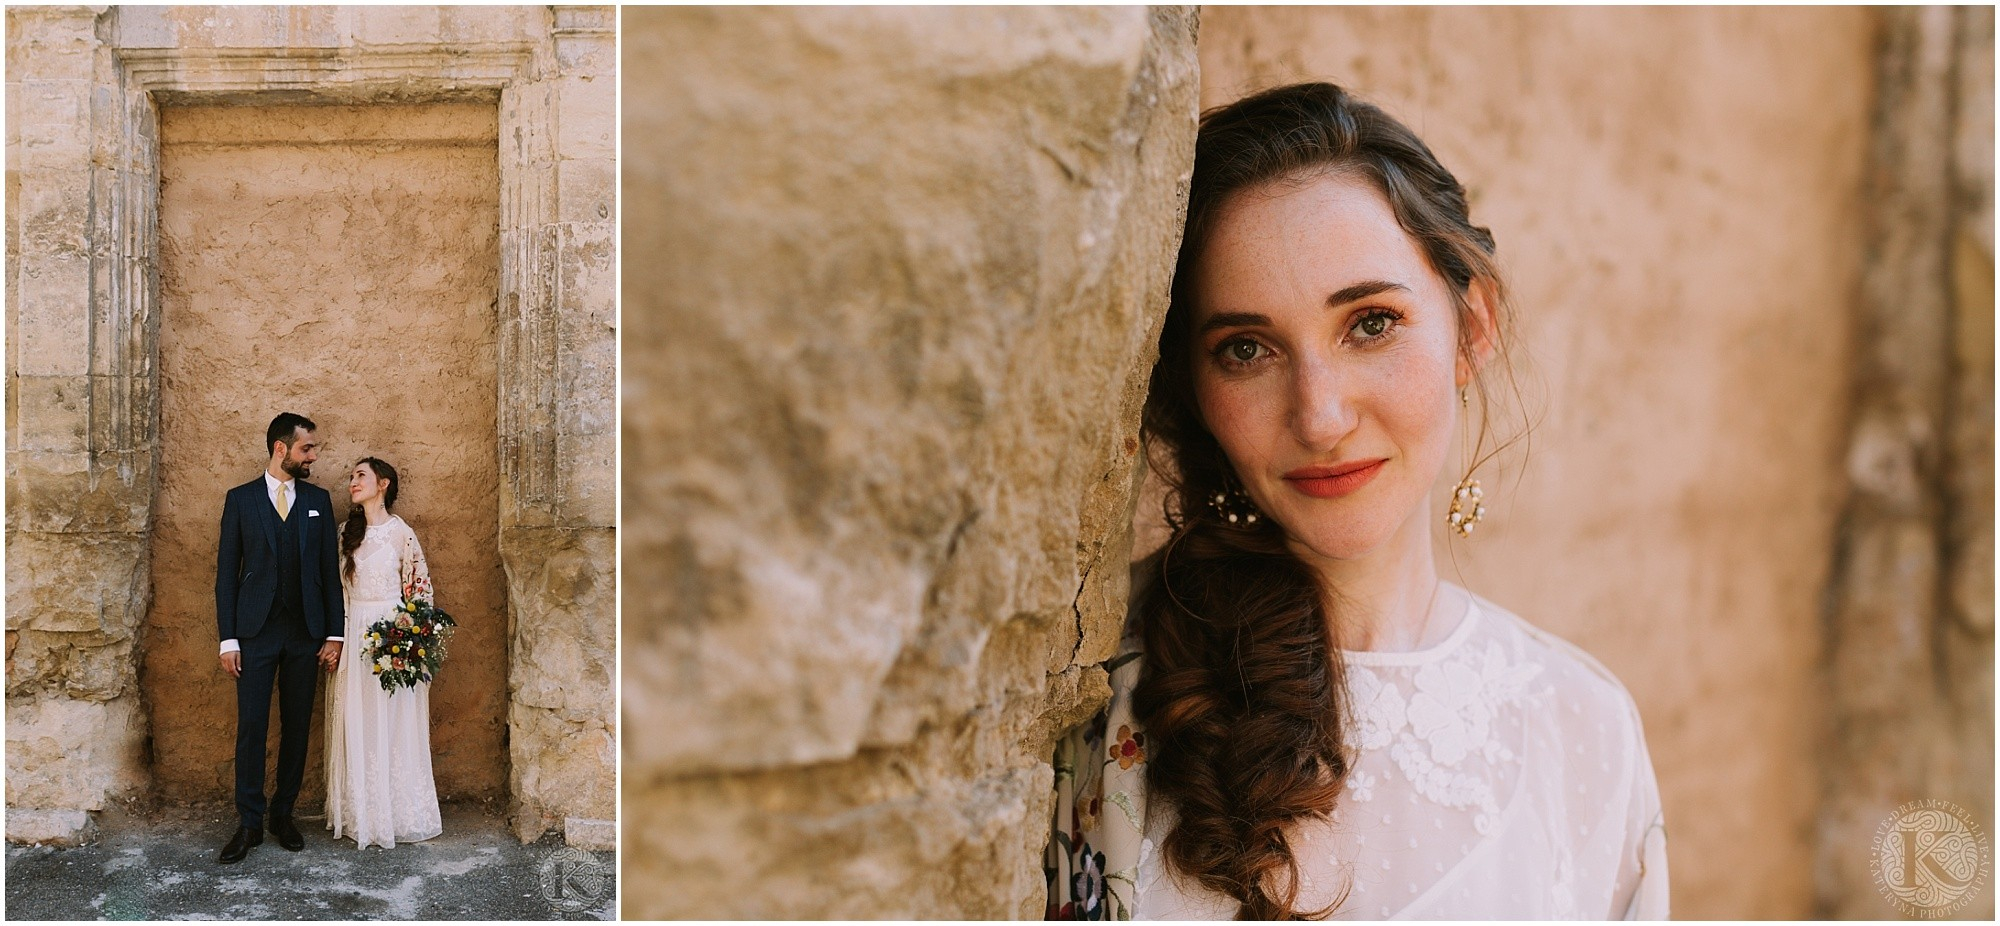 Kateryna-photos-photographe-mariage-vaucluse-provence-avignon-ferme-st-hugues_0043.jpg